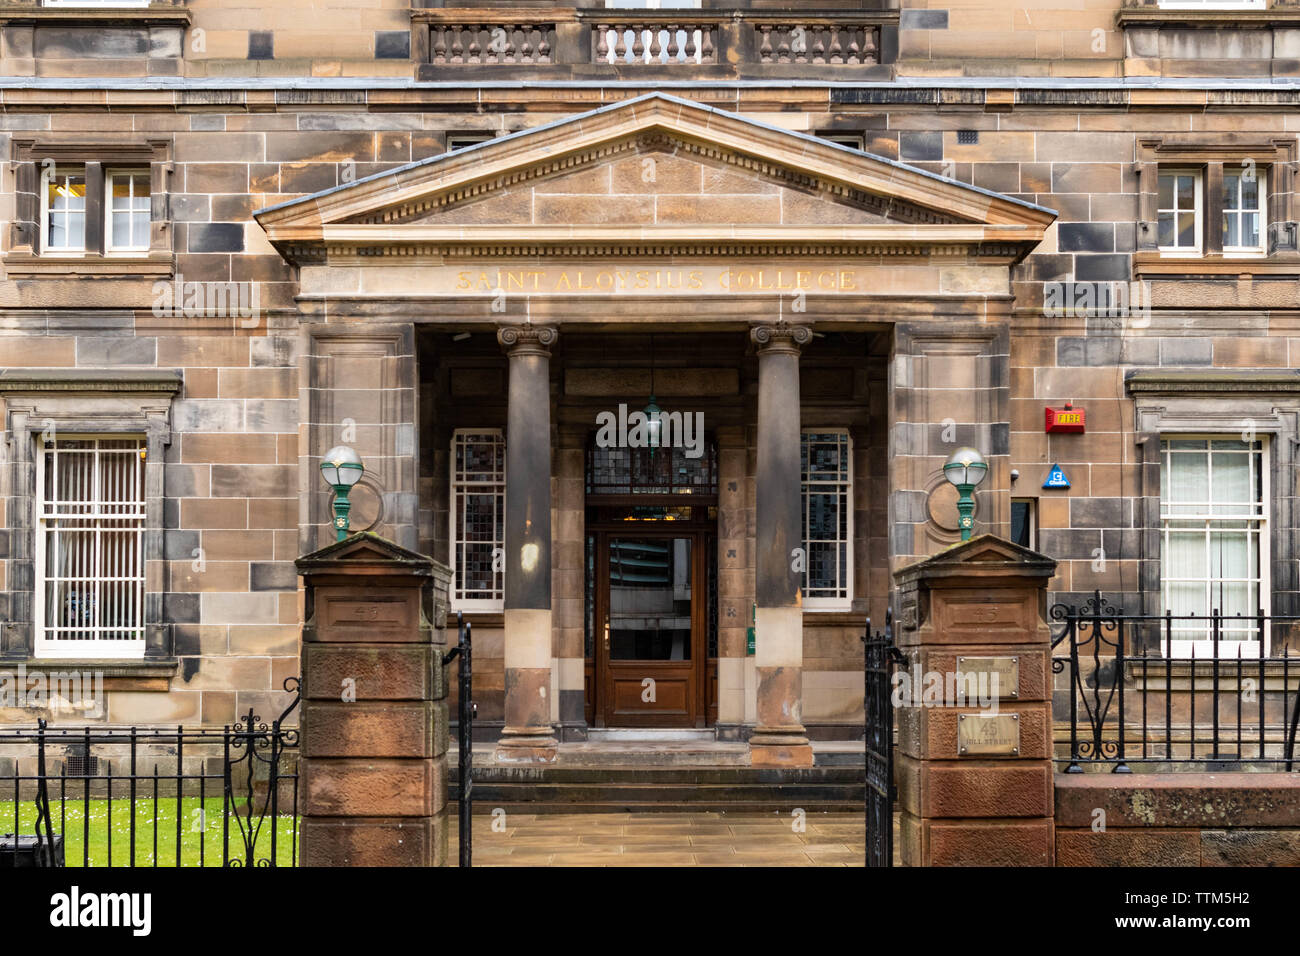 St Aloysius College, a Jesuit Private School in Glasgow, Scotland, UK - Stock Image